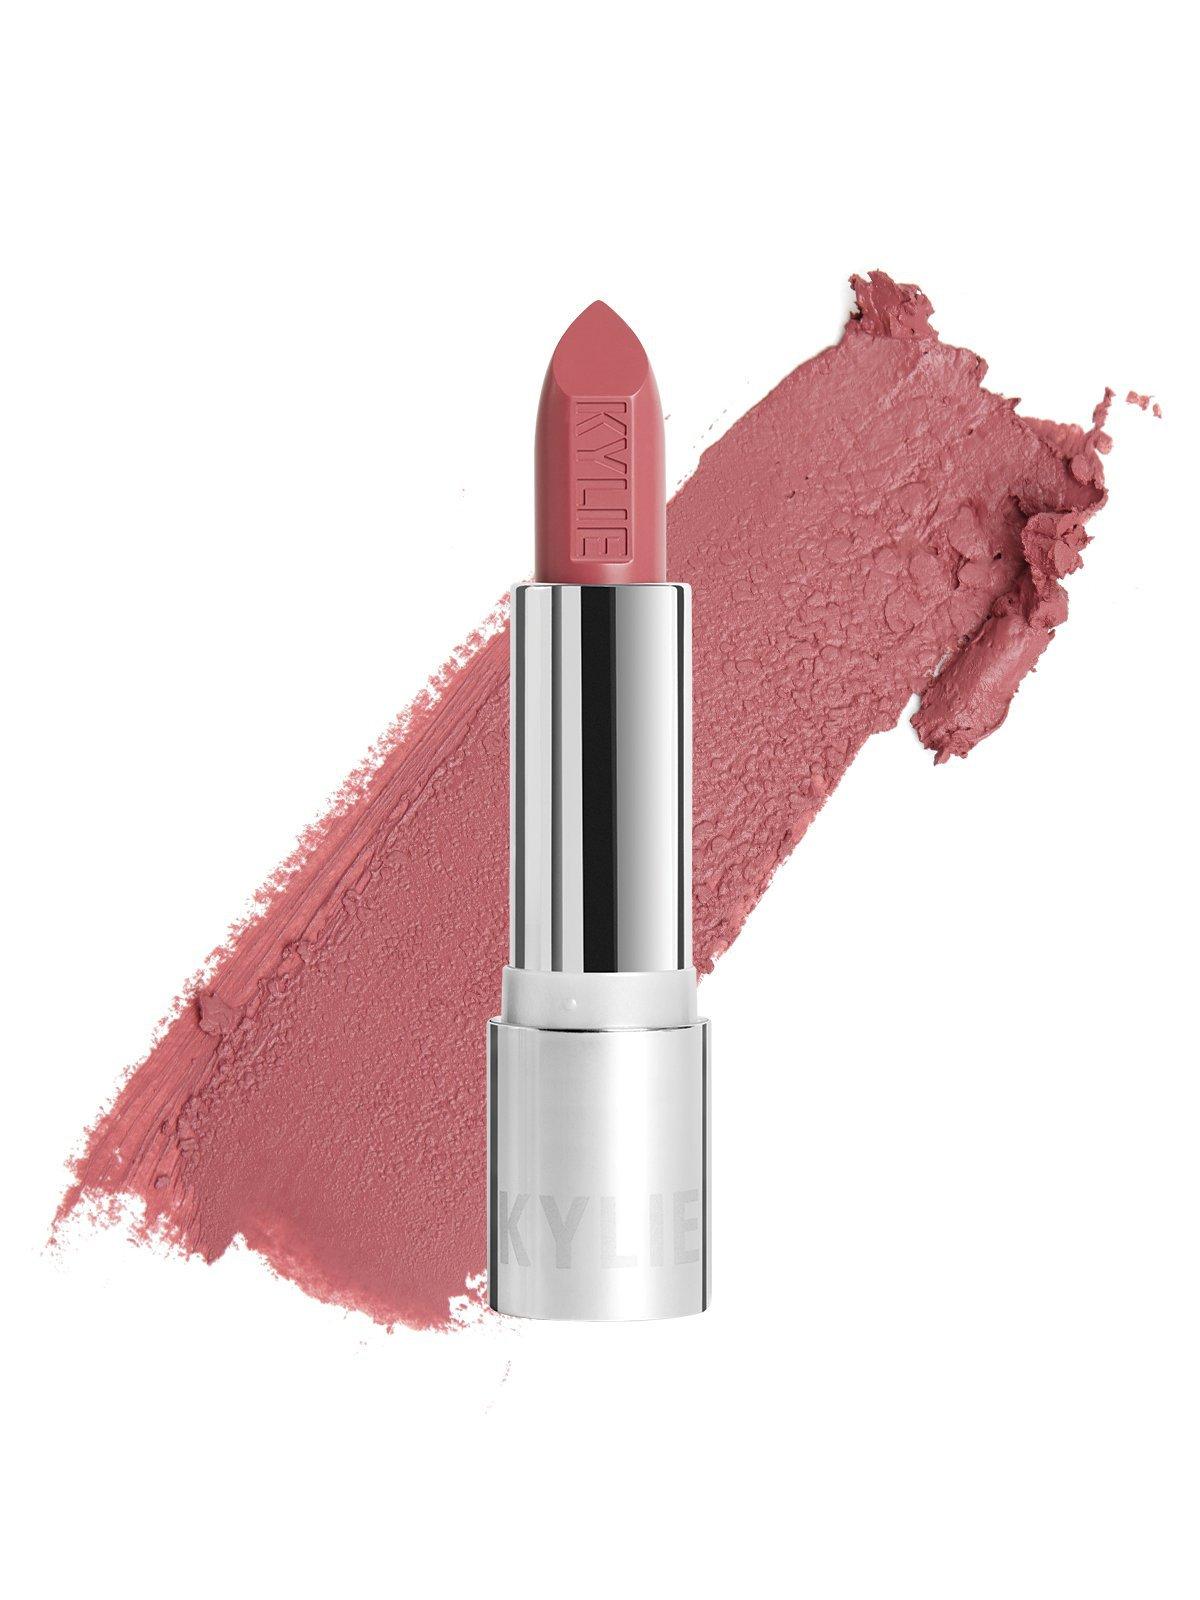 Crème Lipsticks | Kylie Cosmetics by Kylie Jenner